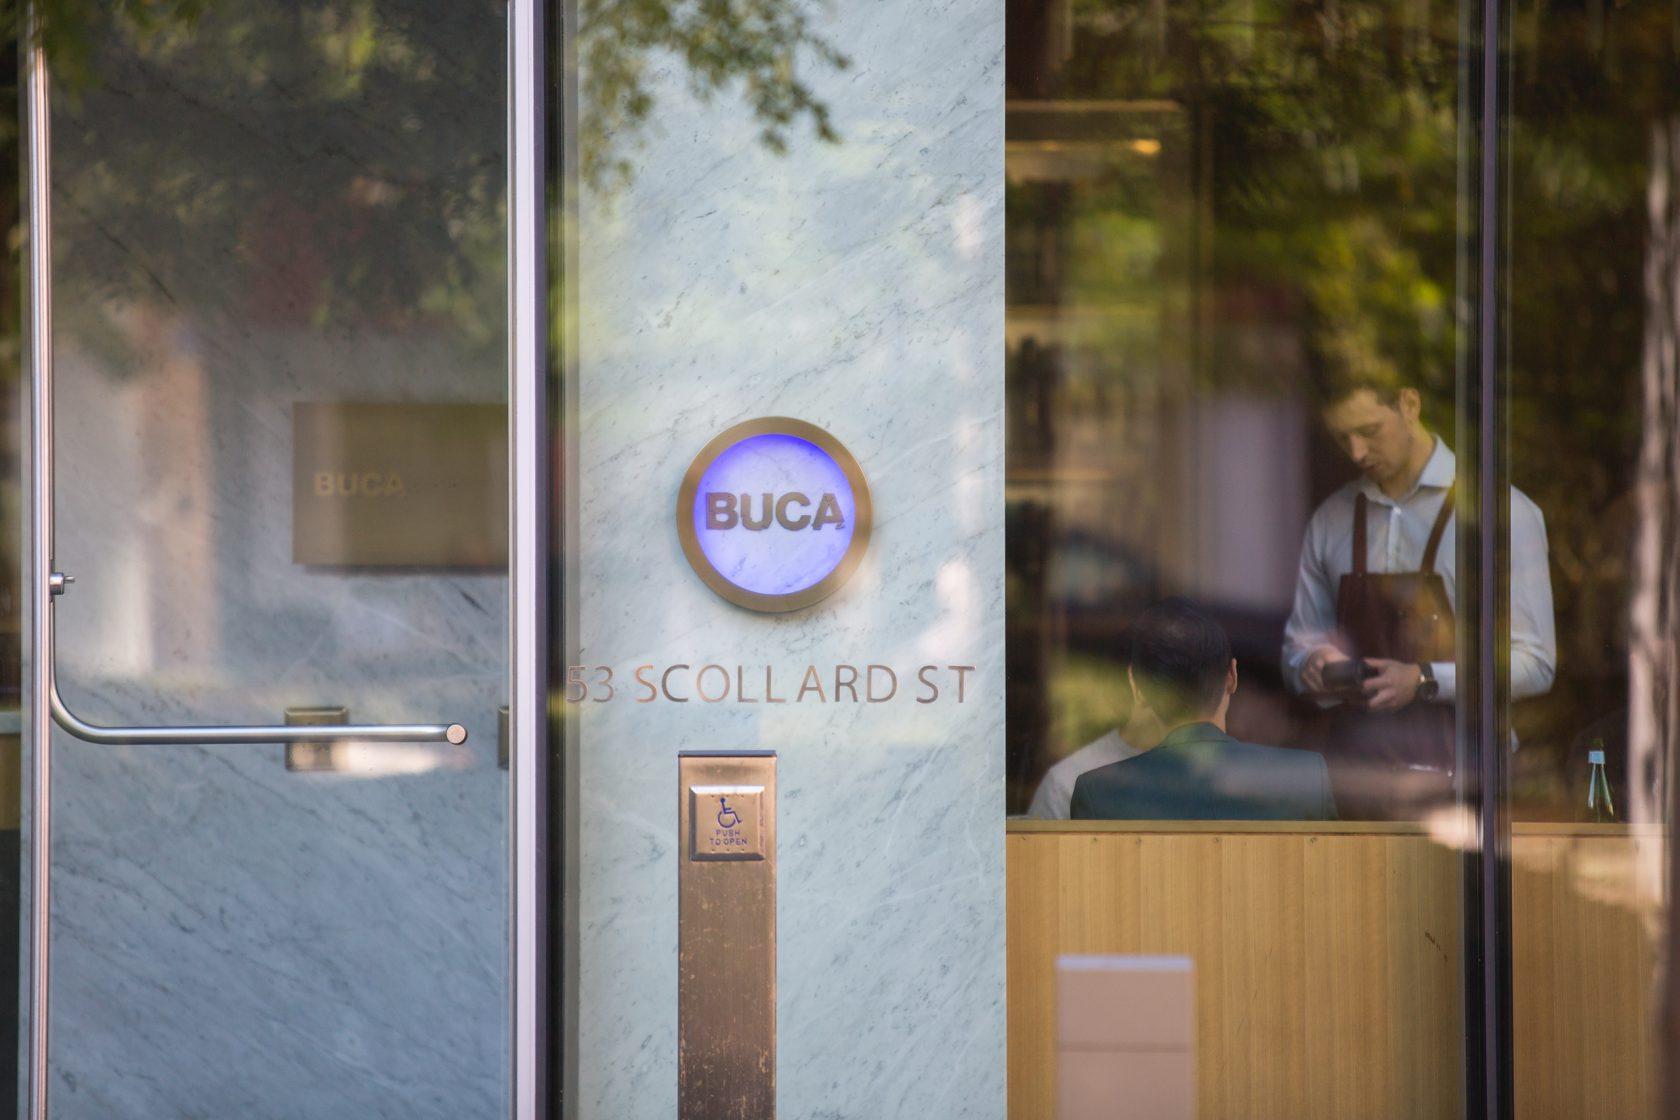 The Livmore Neighbourhood - Buca (Restaurant)